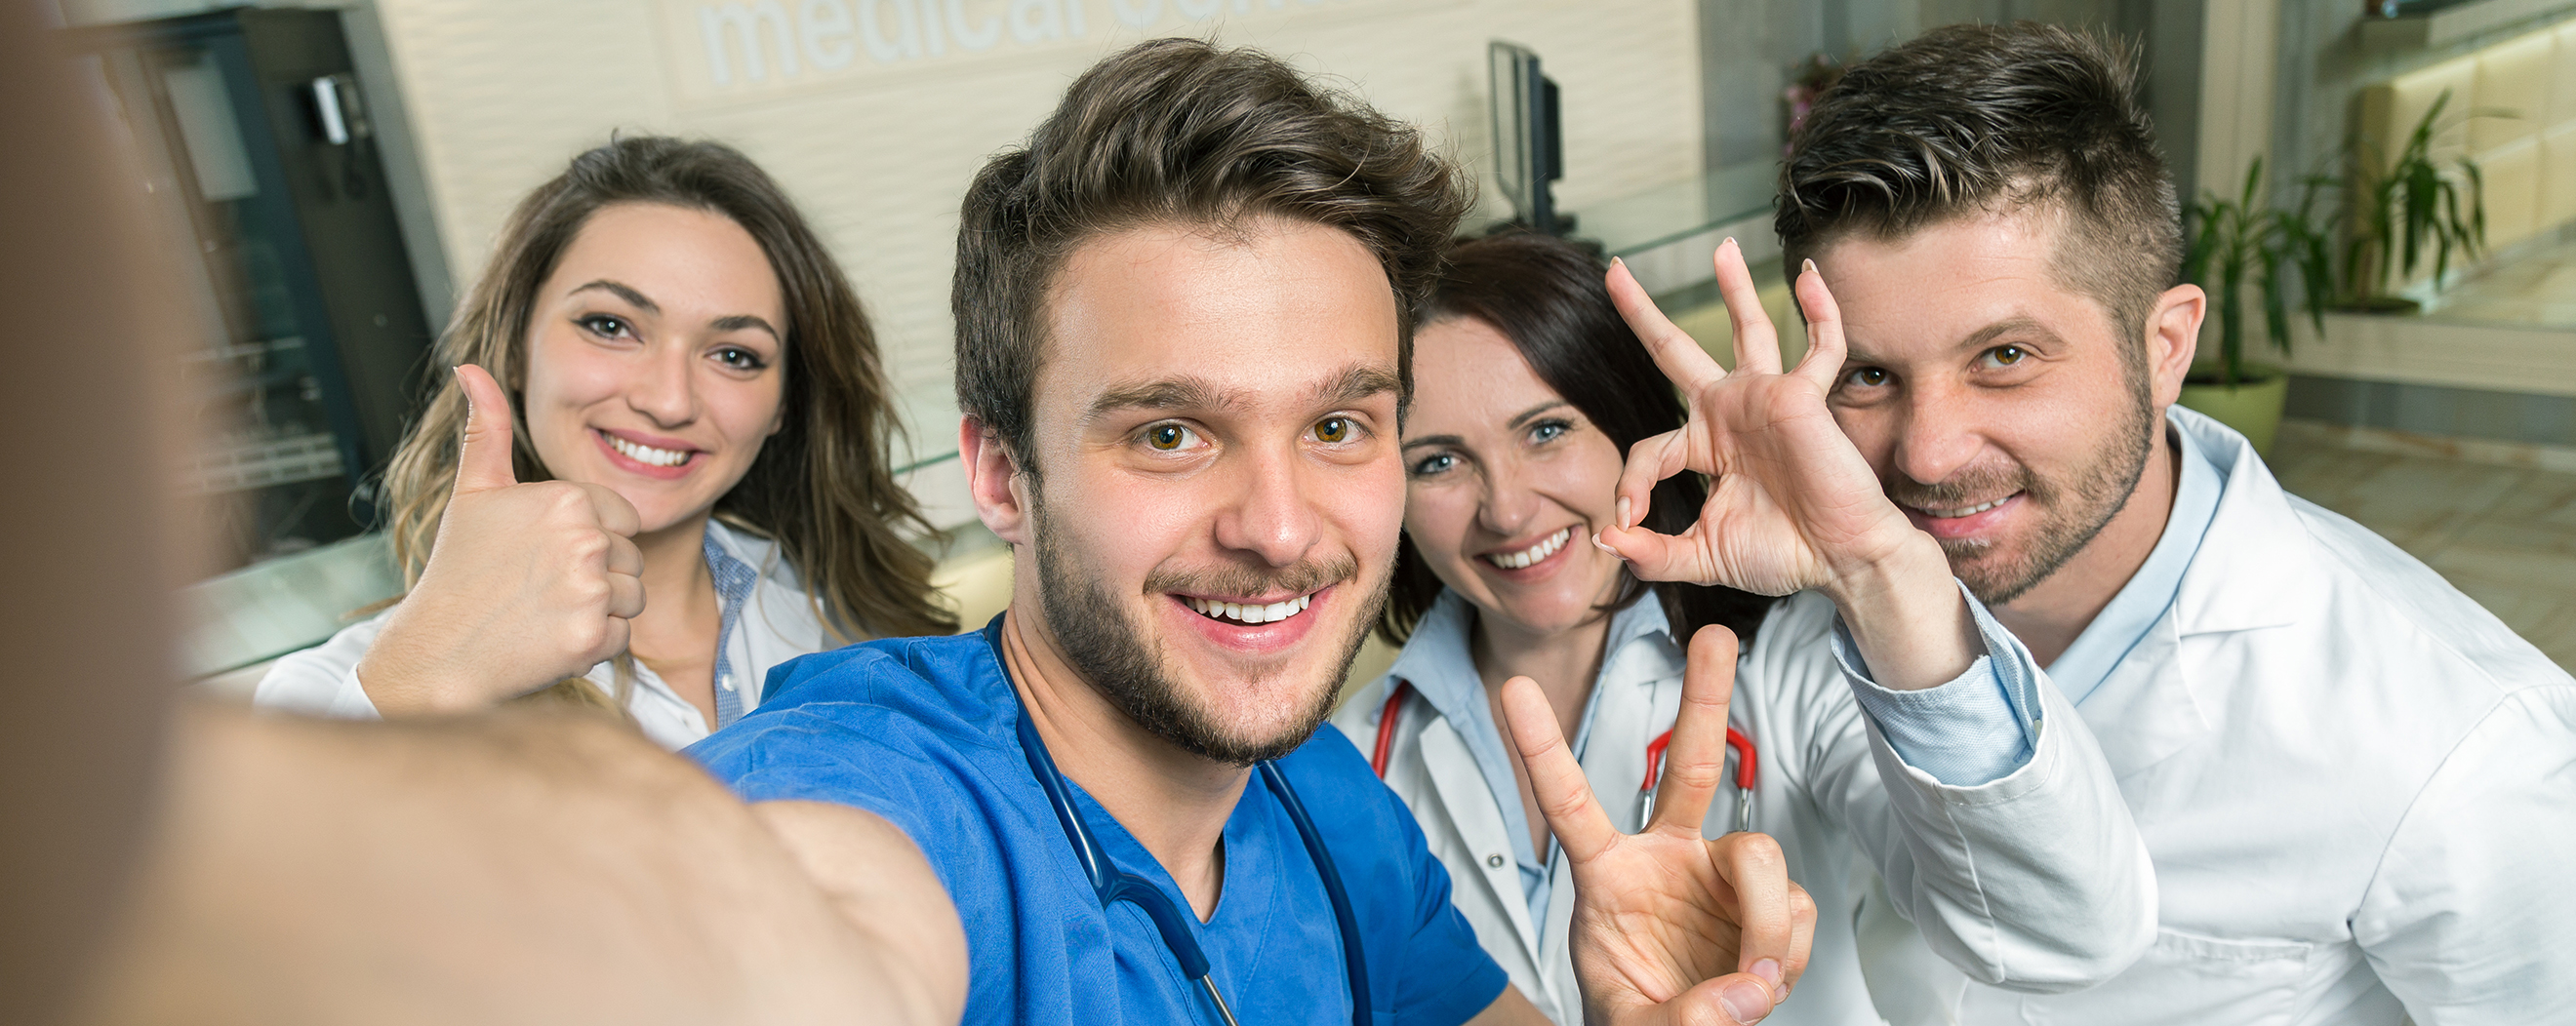 Male Nurse At Hospital Taking Selfie